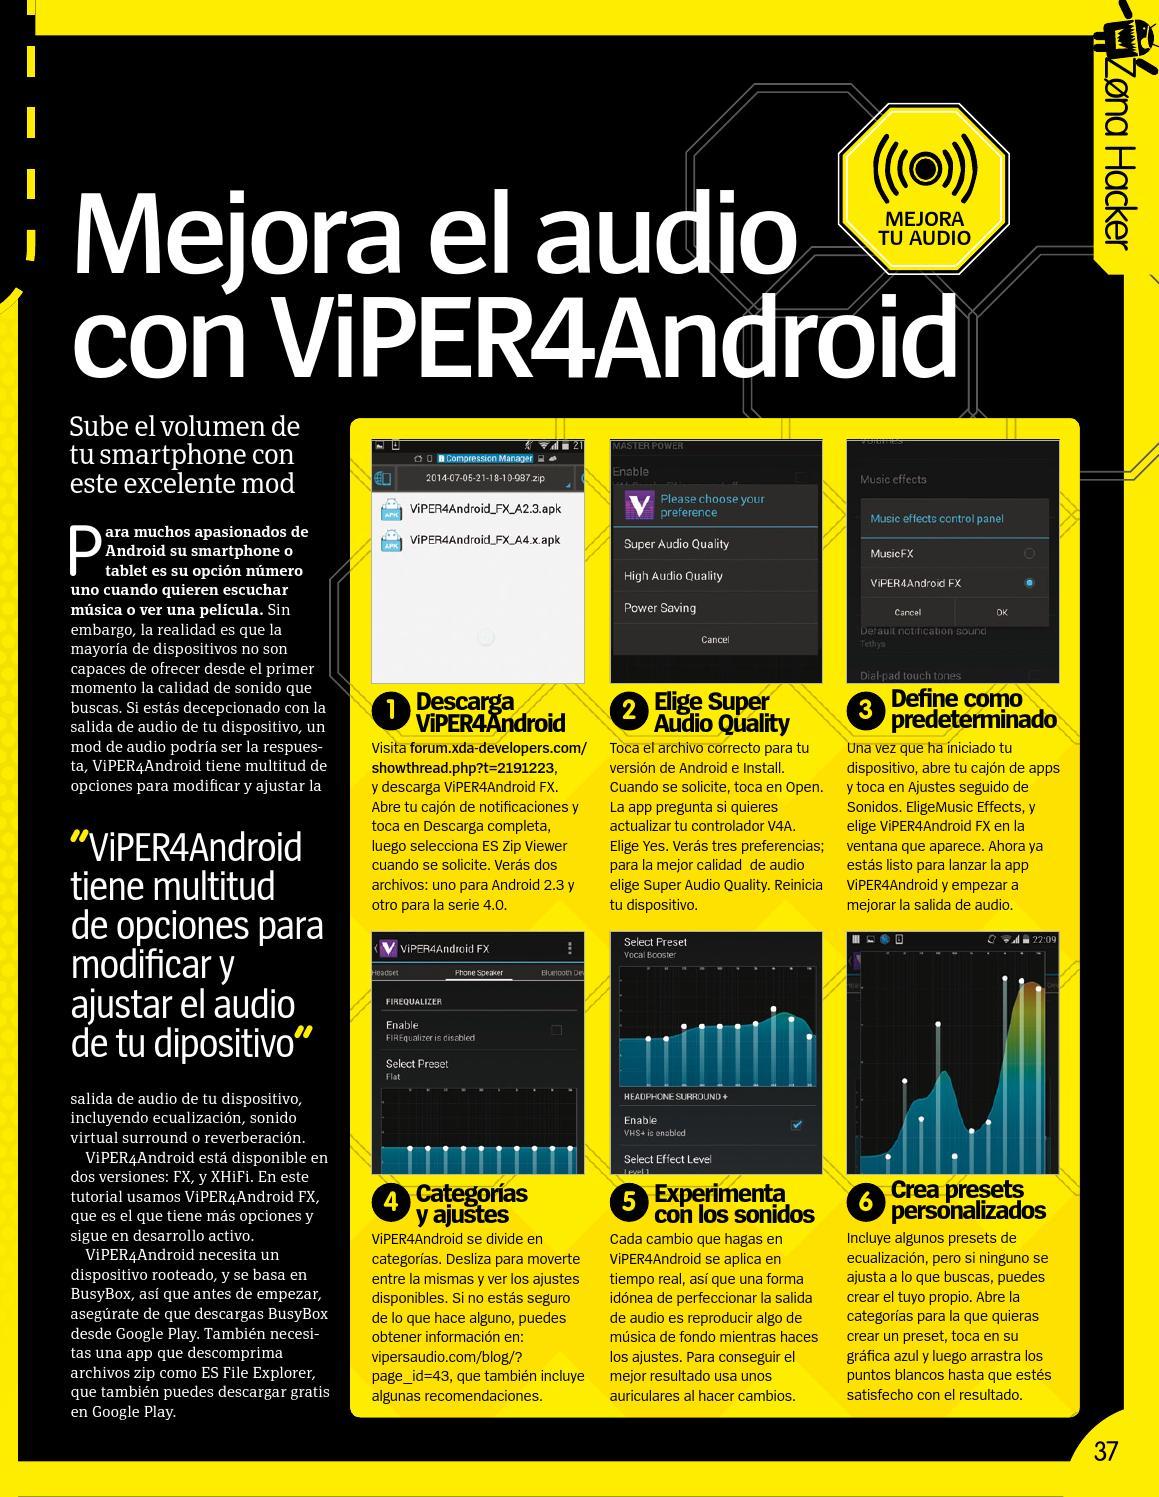 Android magazine nº 34 octubre 2014 by alberto alarcon - issuu